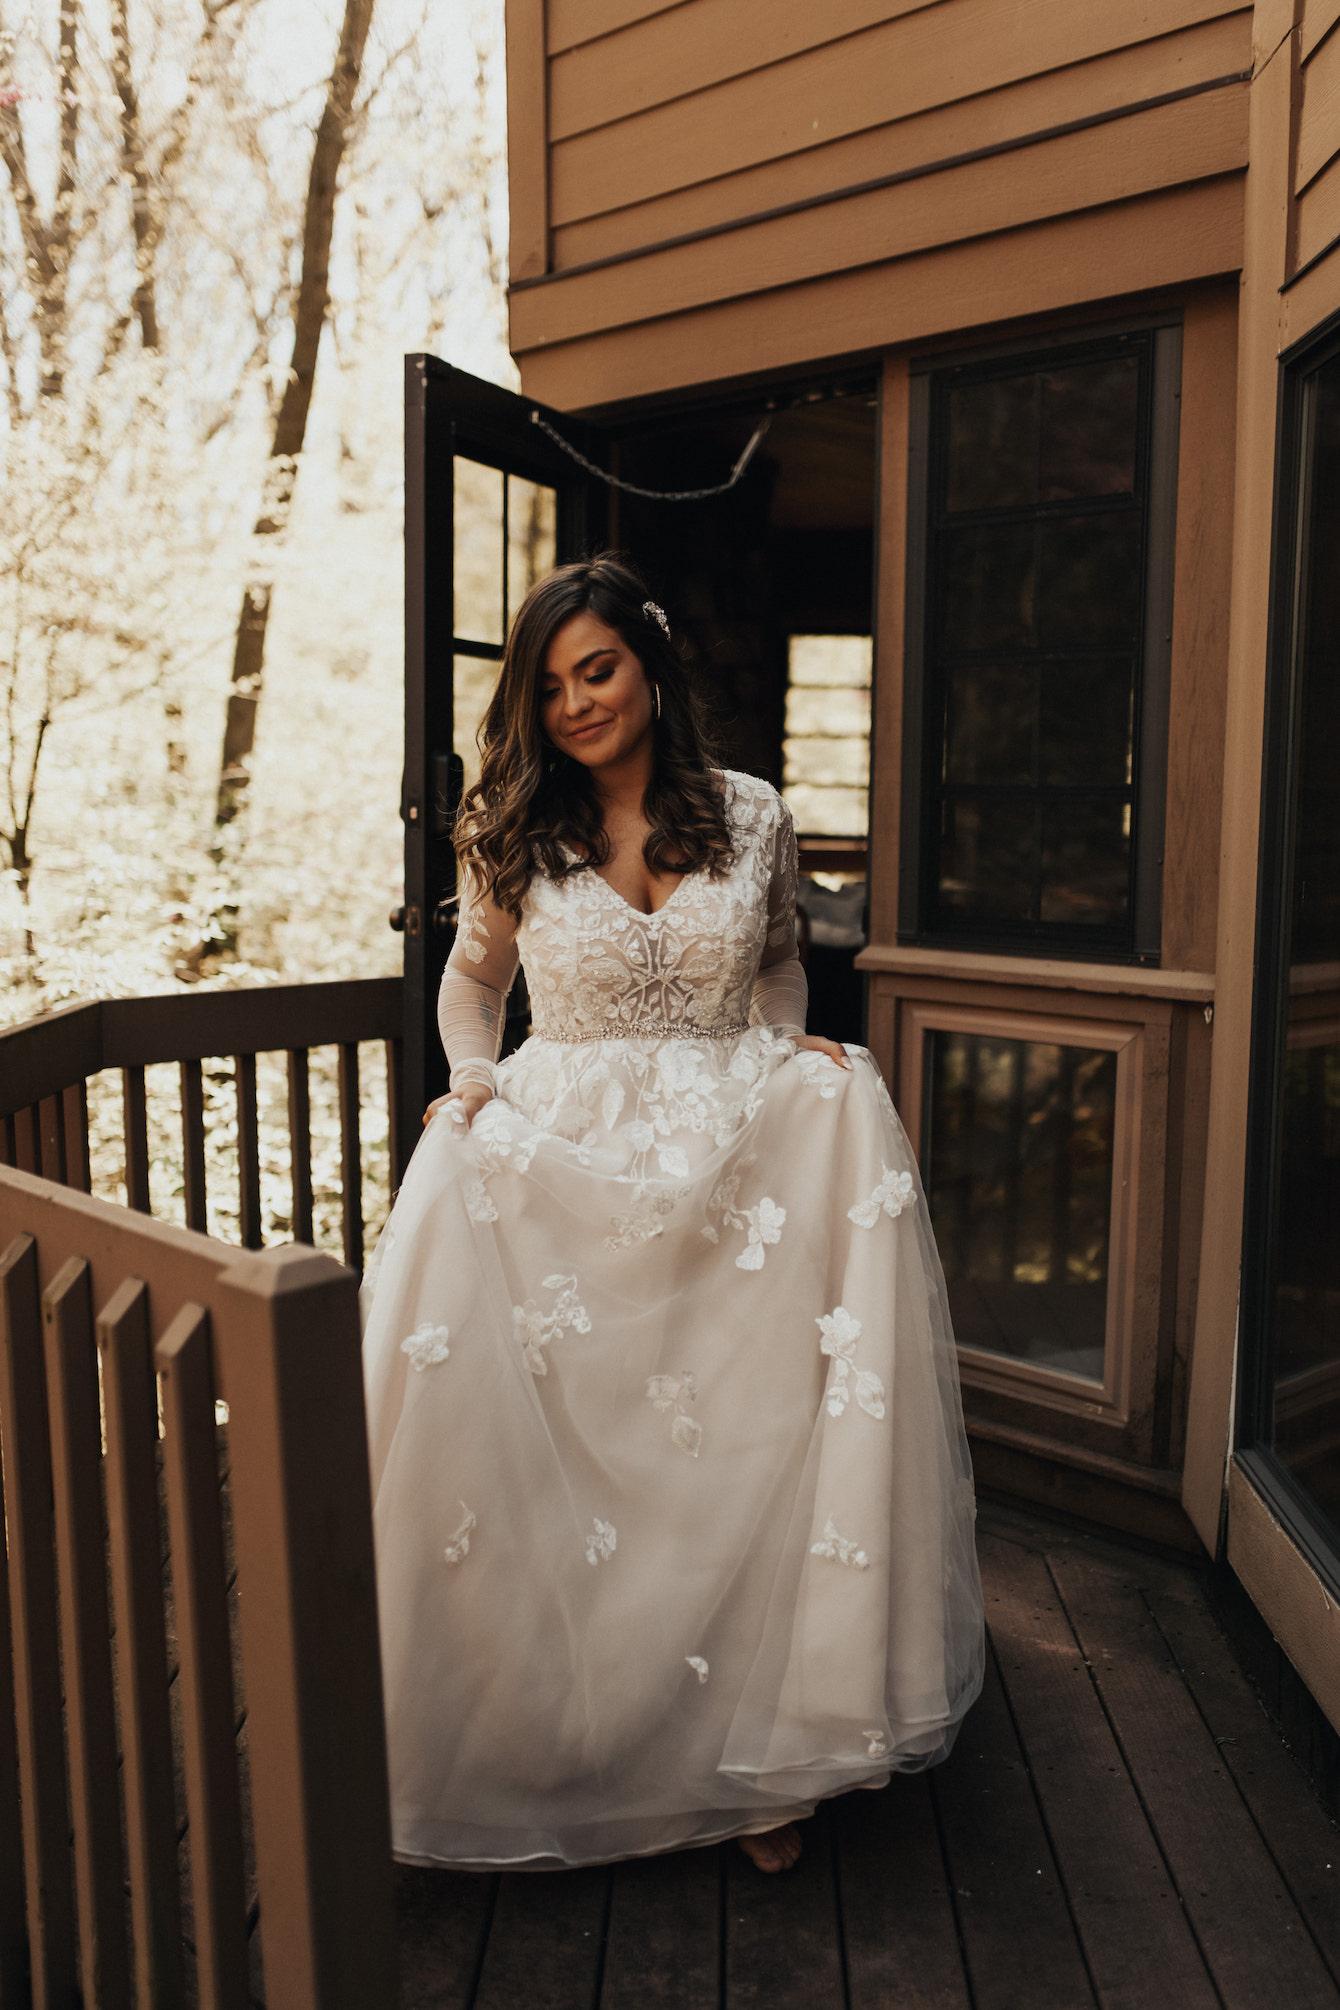 Solo bride shot leaving the house